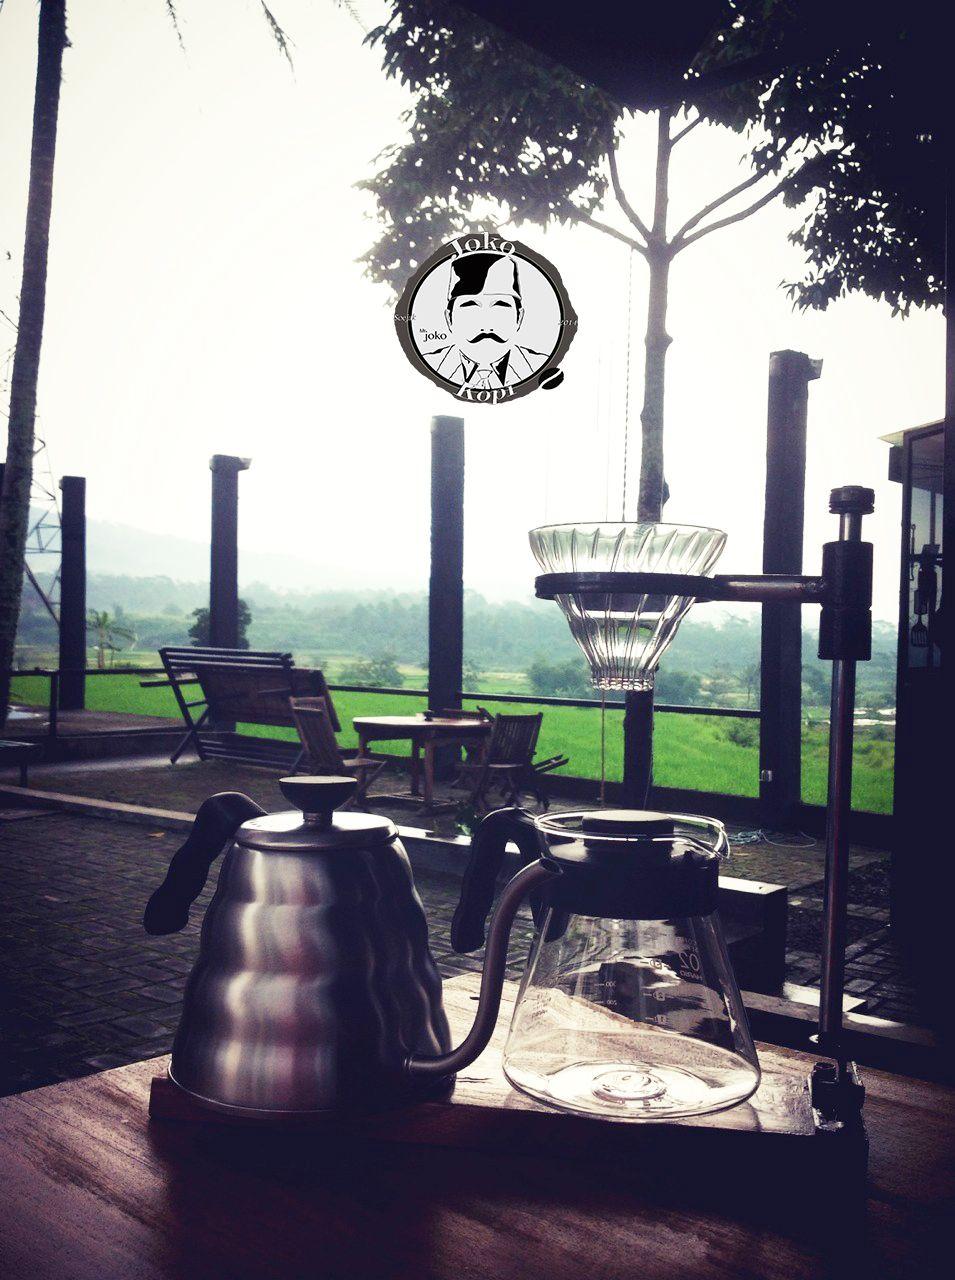 Joko Kopi in Semarang, Jawa Tengah #hario #pour #over #v60 #manual #brewing #indonesia #semarang #ungaran #valley #coffee #shop #single #origin #green #tea #caffe #hand #made